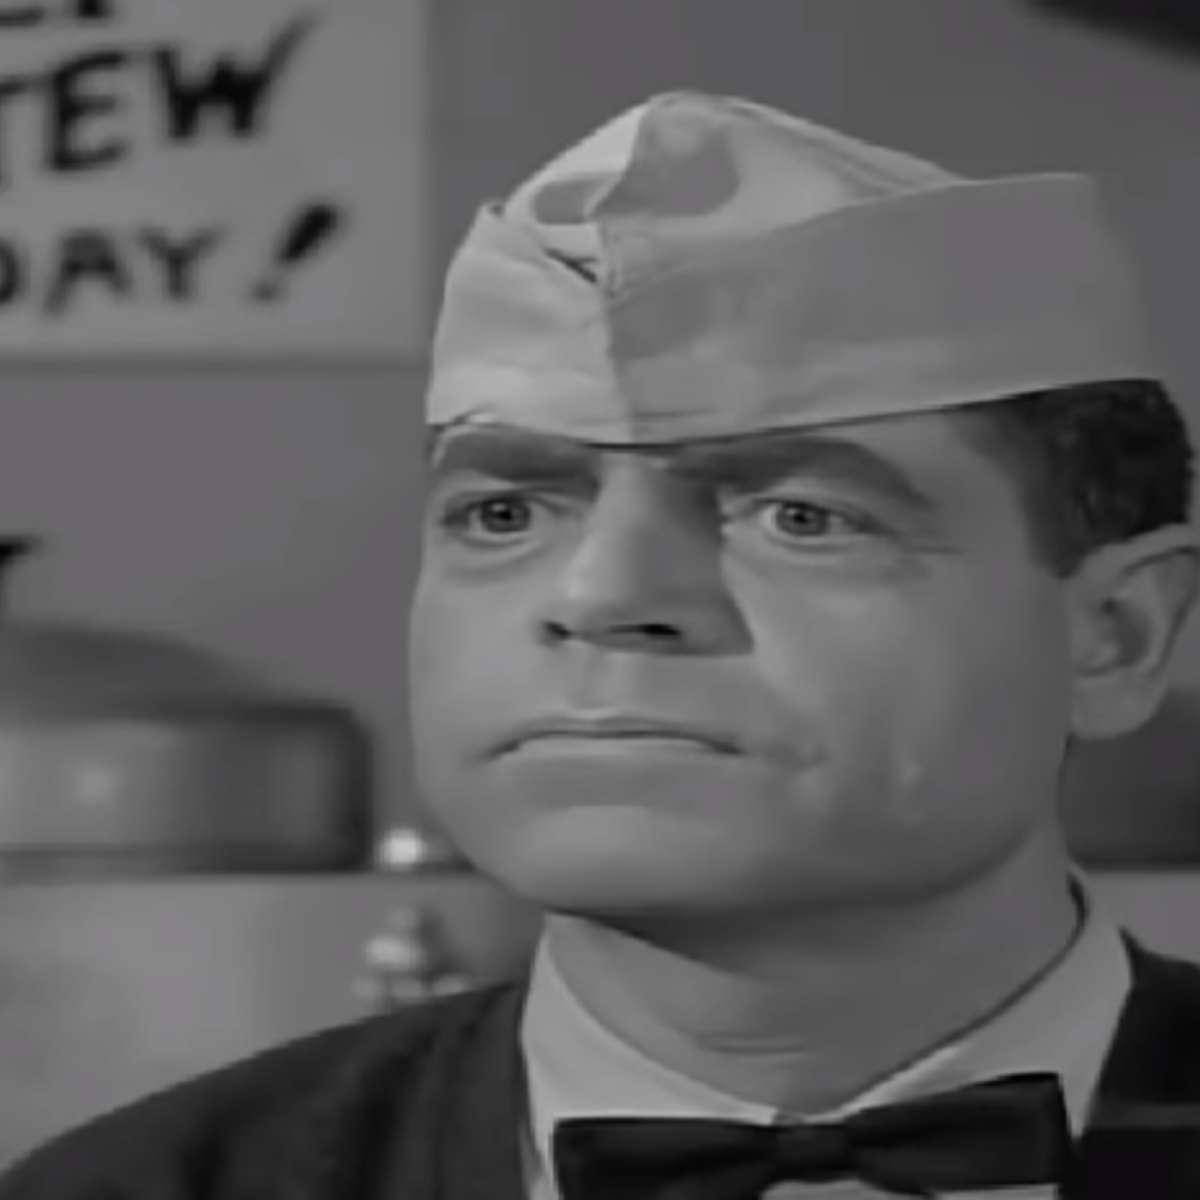 Barney Phillips, The Twilight Zone